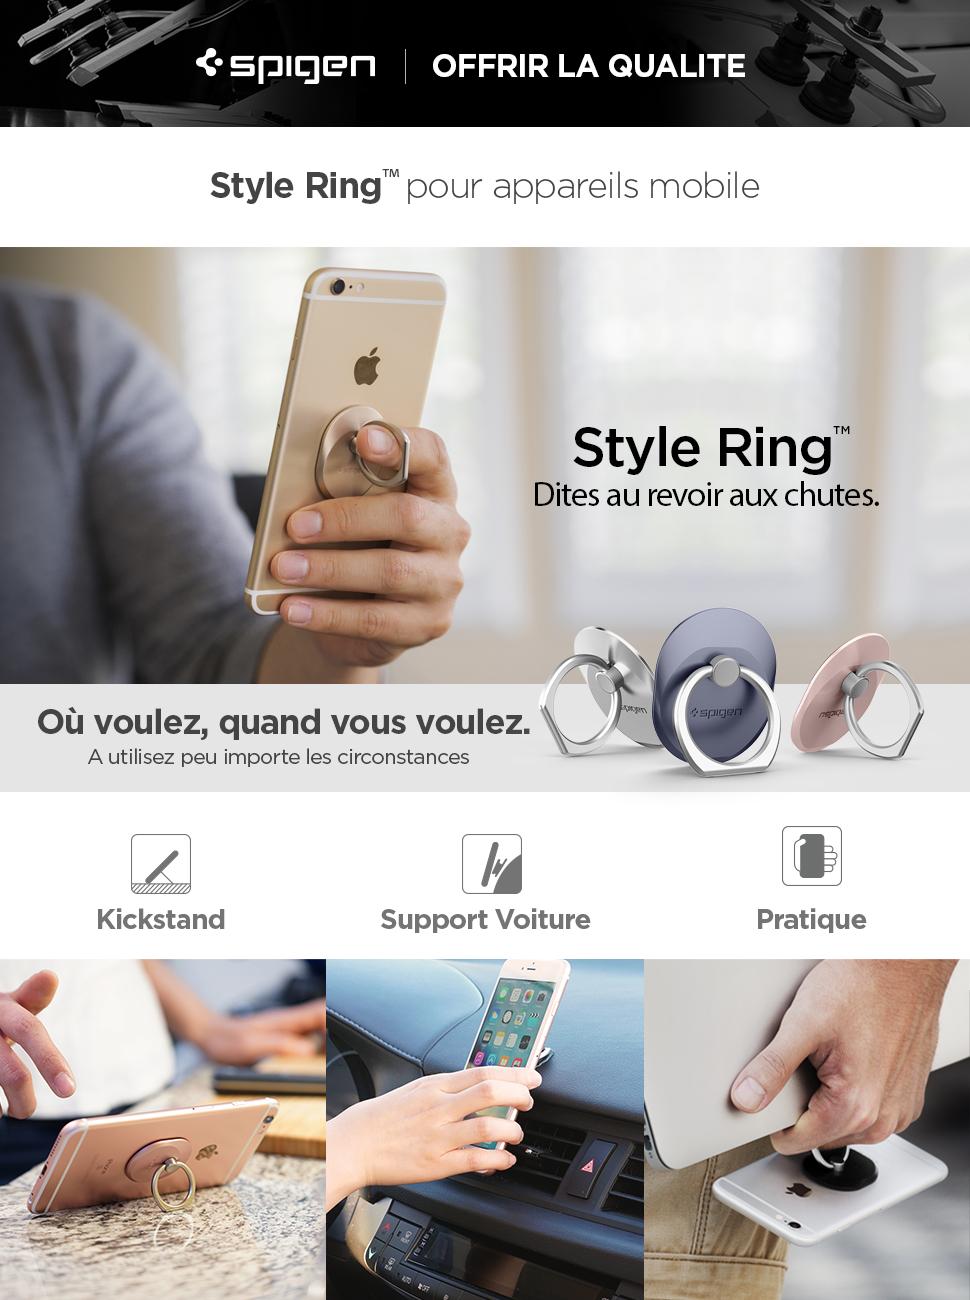 Support Bague, Spigen[Style Ring][Ne jamais tomber votre telephone] Support Telephone Bague